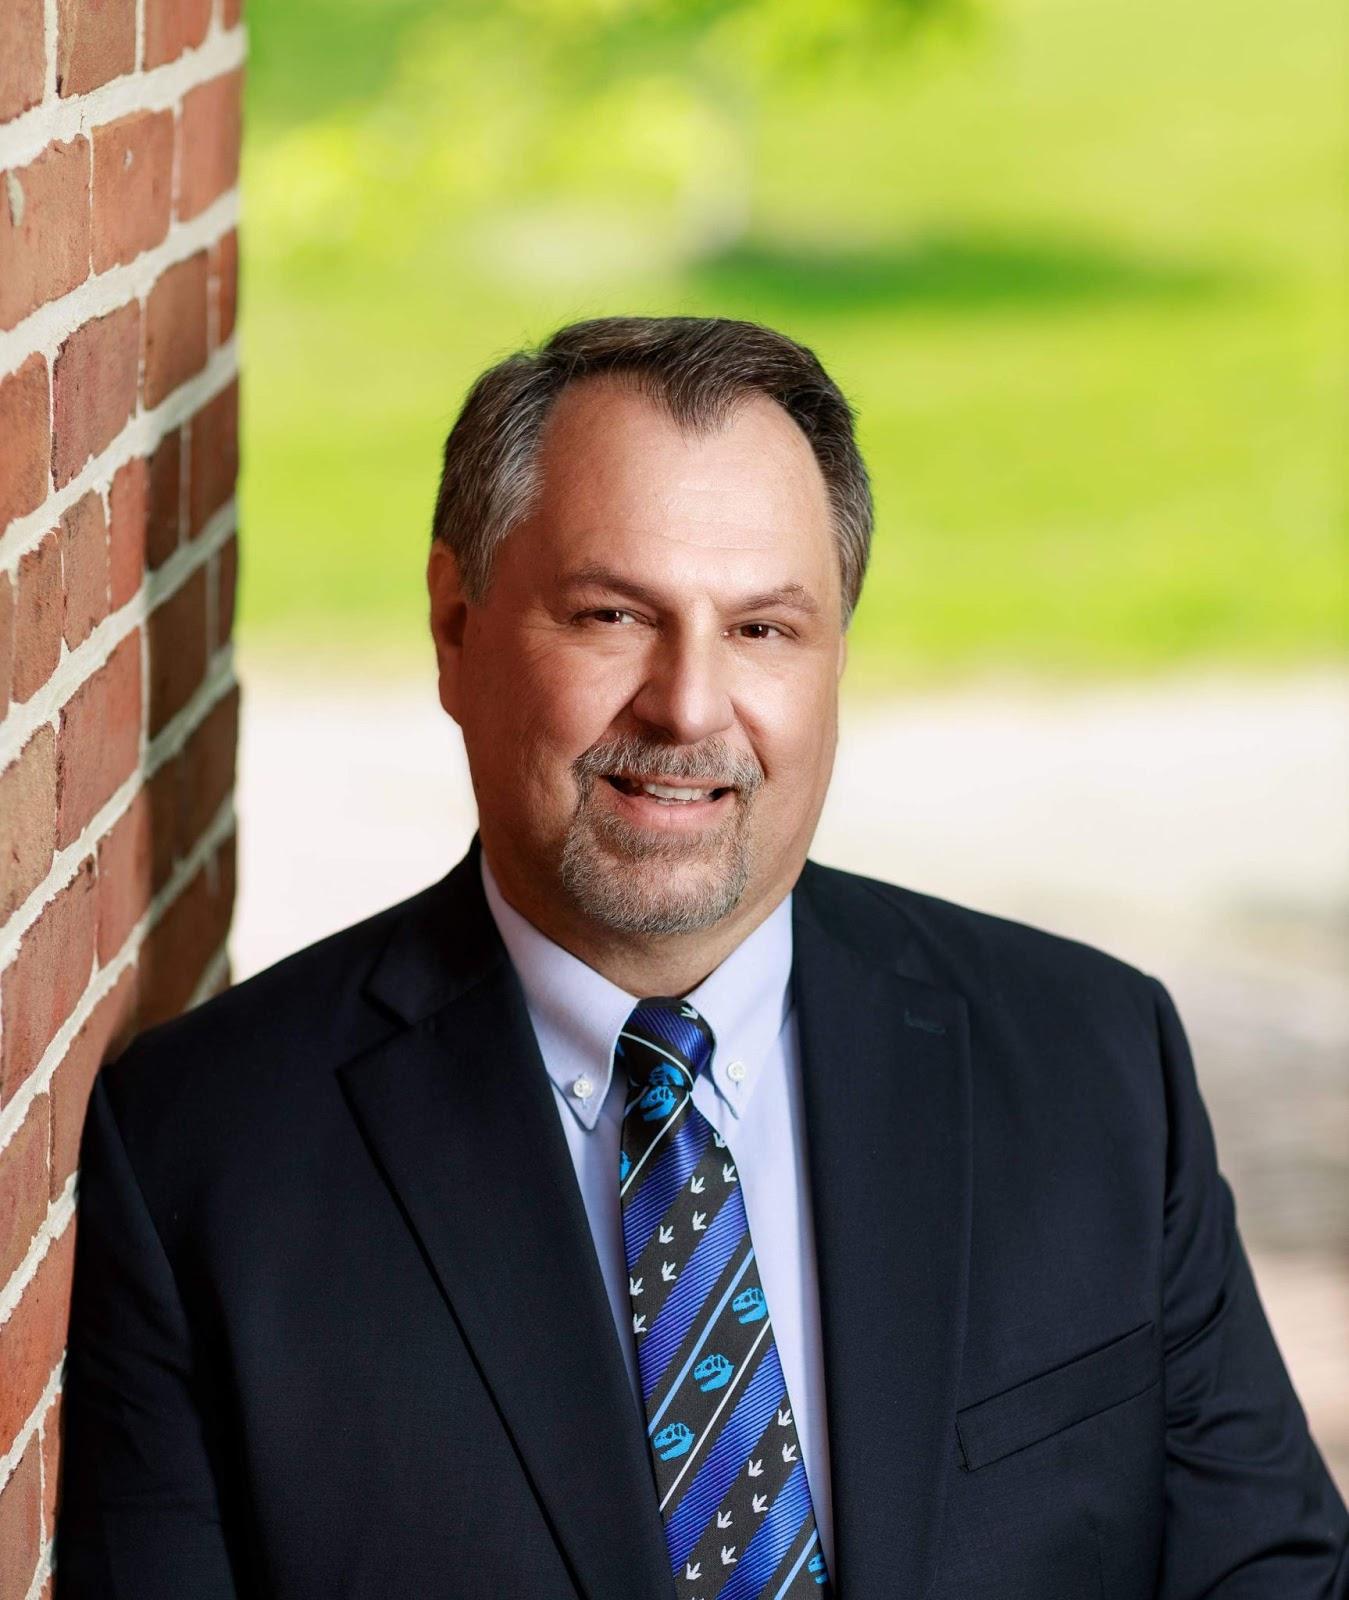 Dr. Alan Thomalla